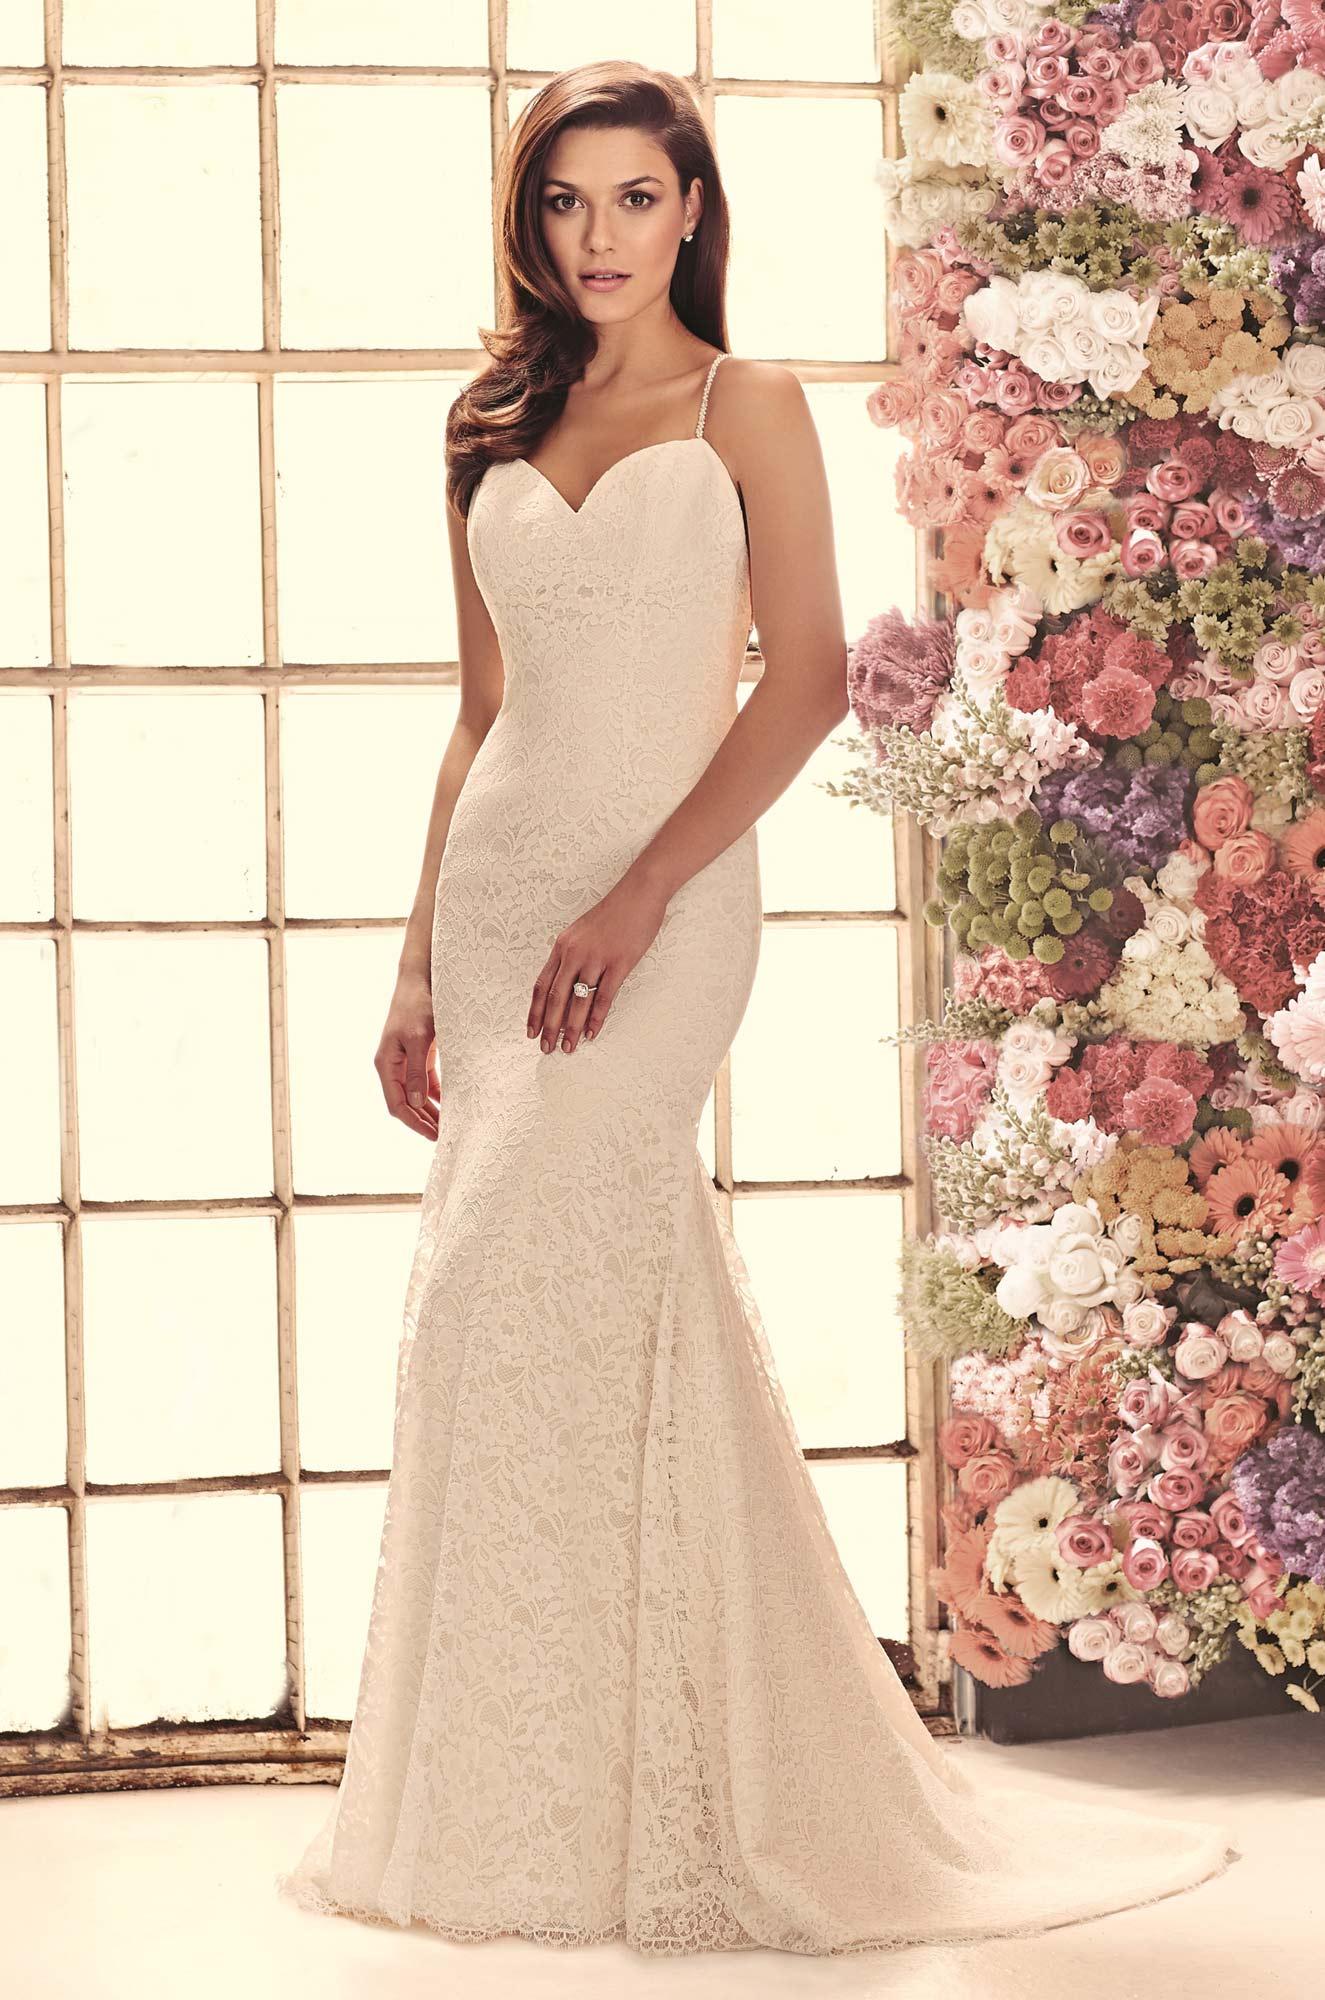 Open back lace wedding dress style 1911 mikaella bridal junglespirit Image collections